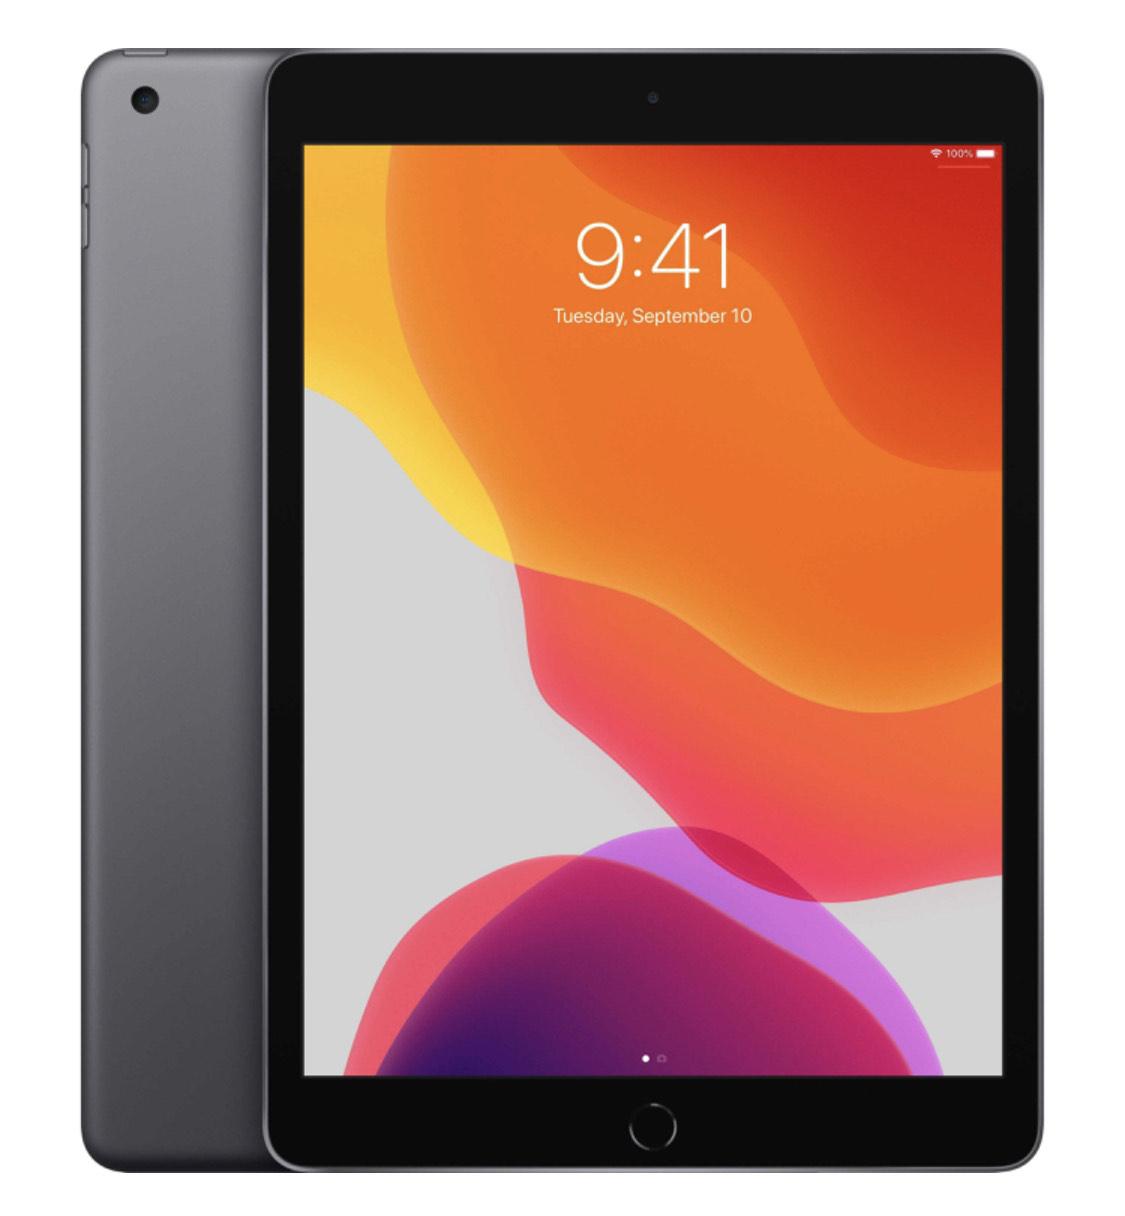 "iPad 9.7"" (2018) - A10, 2 Go RAM, 32 Go, Wi-Fi (263.99€ avec BF12100)"